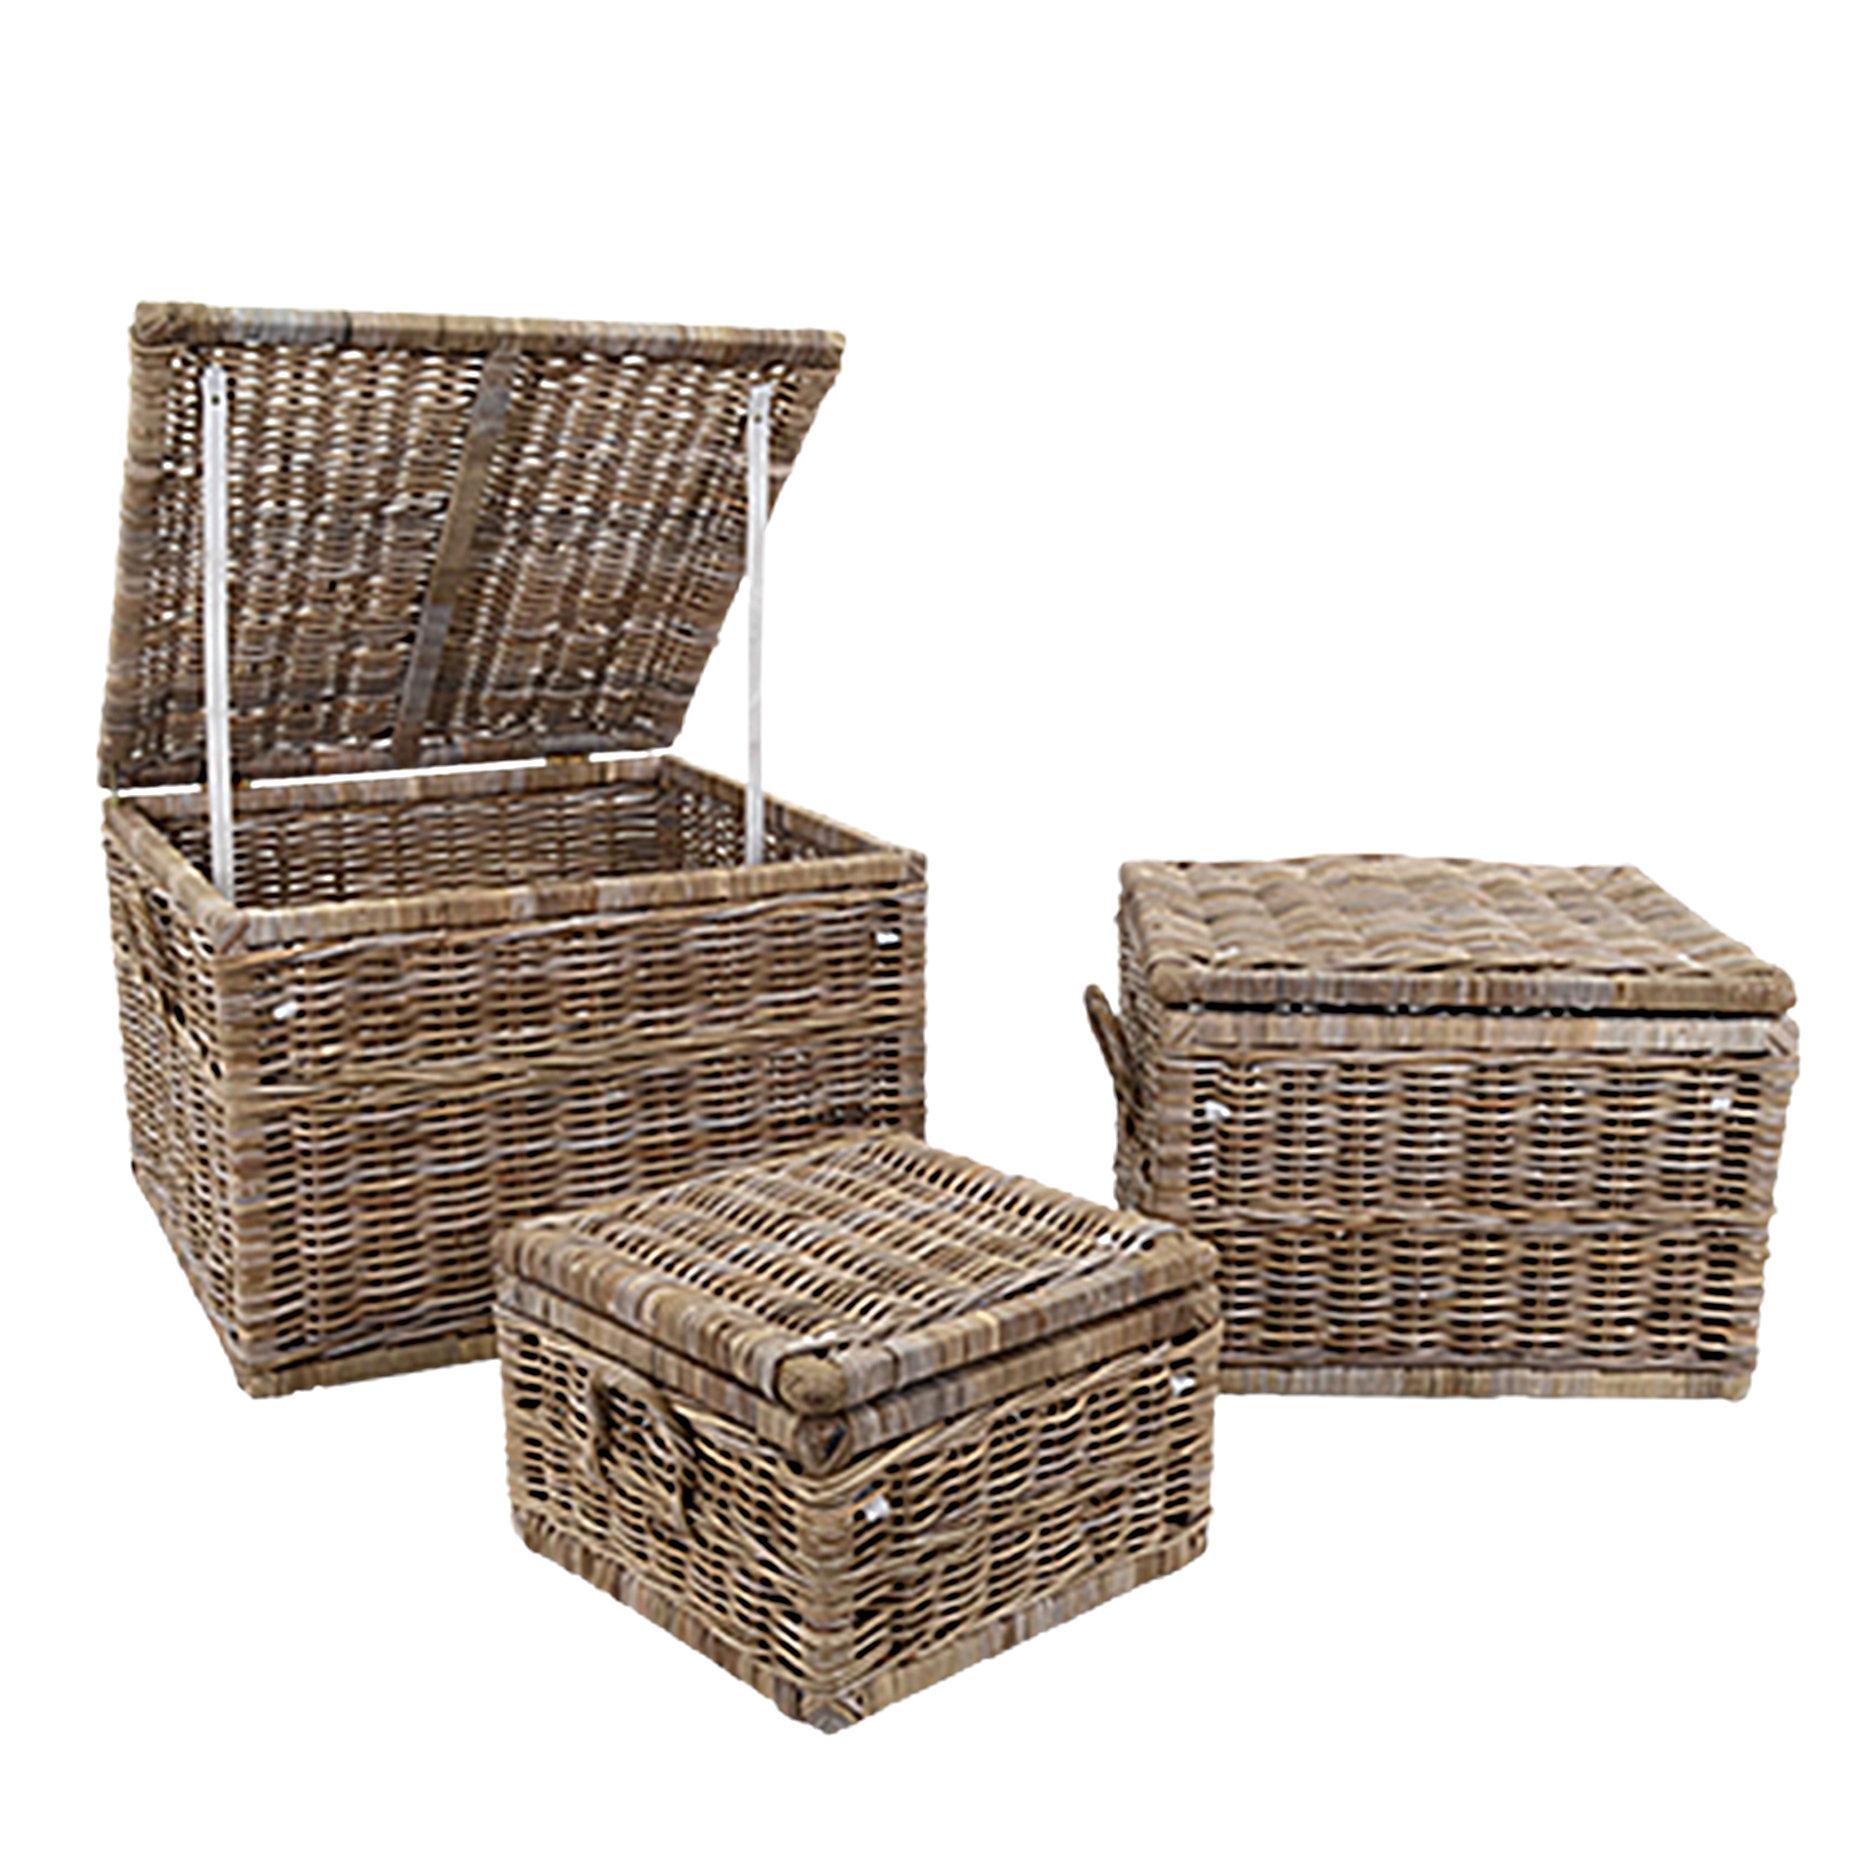 August Grove 3 Piece Wicker Basket Set Wayfair